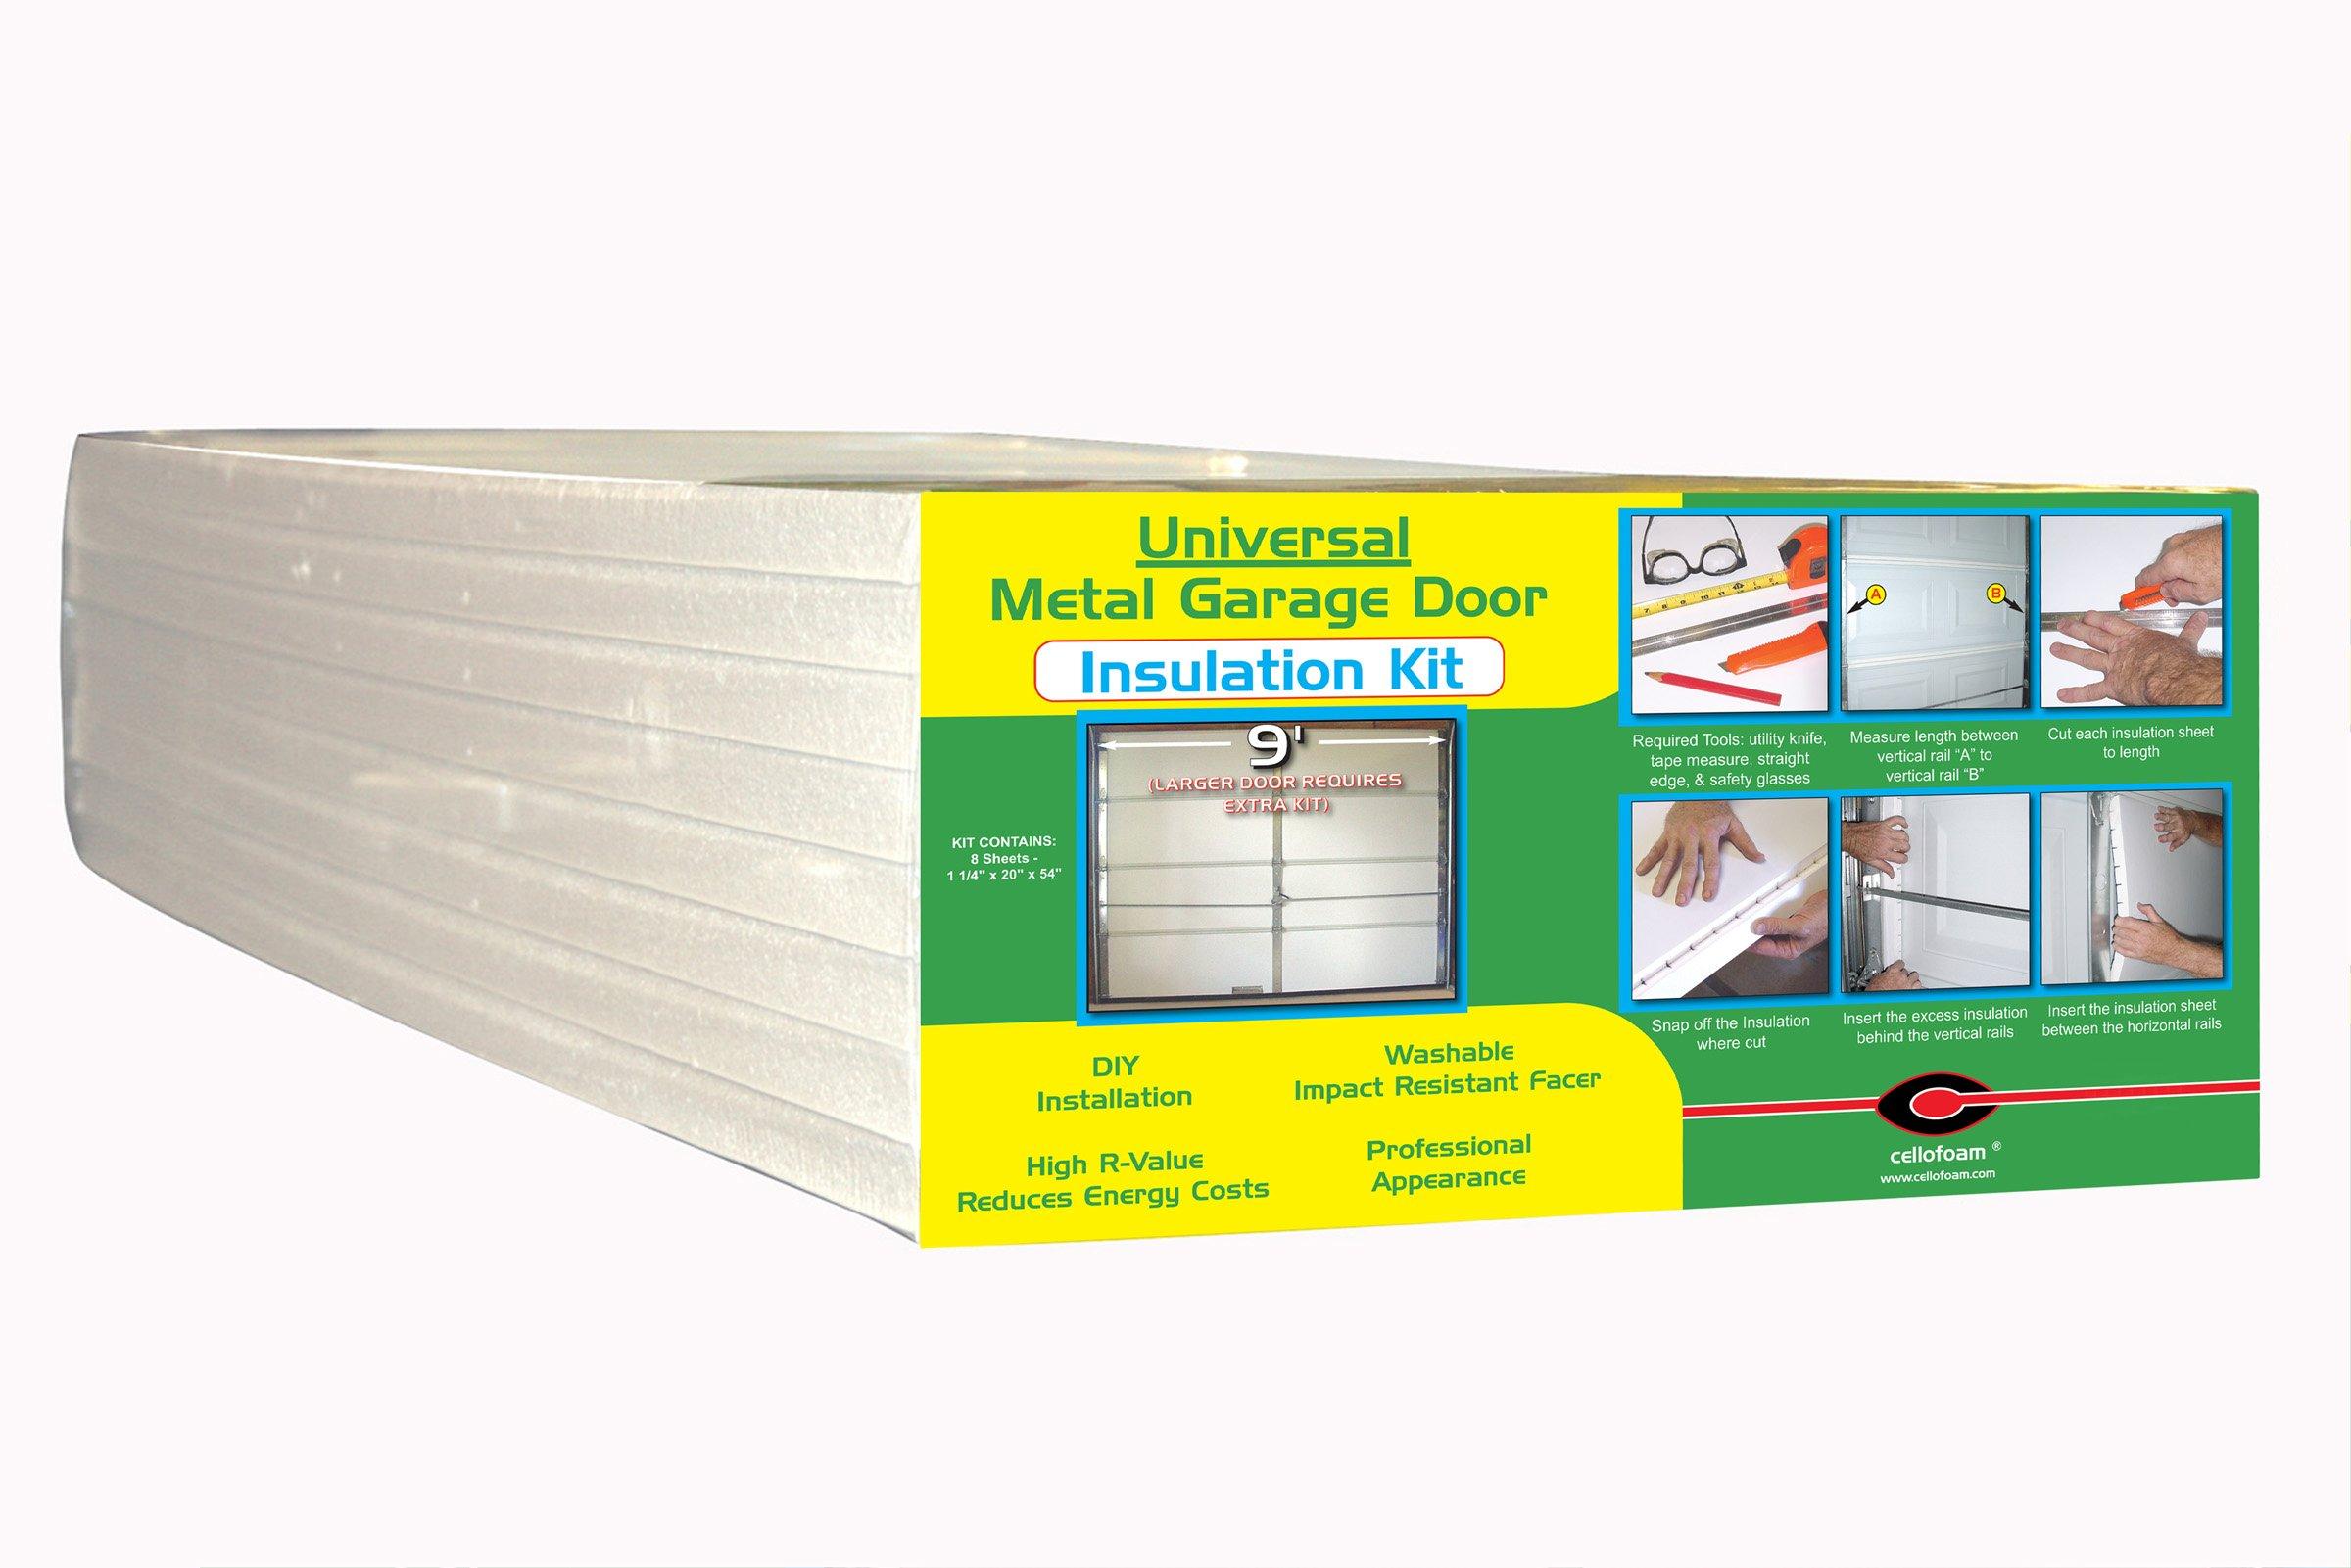 Garage Door Insulation Kit - 8 Foam Panels by Cellofoam